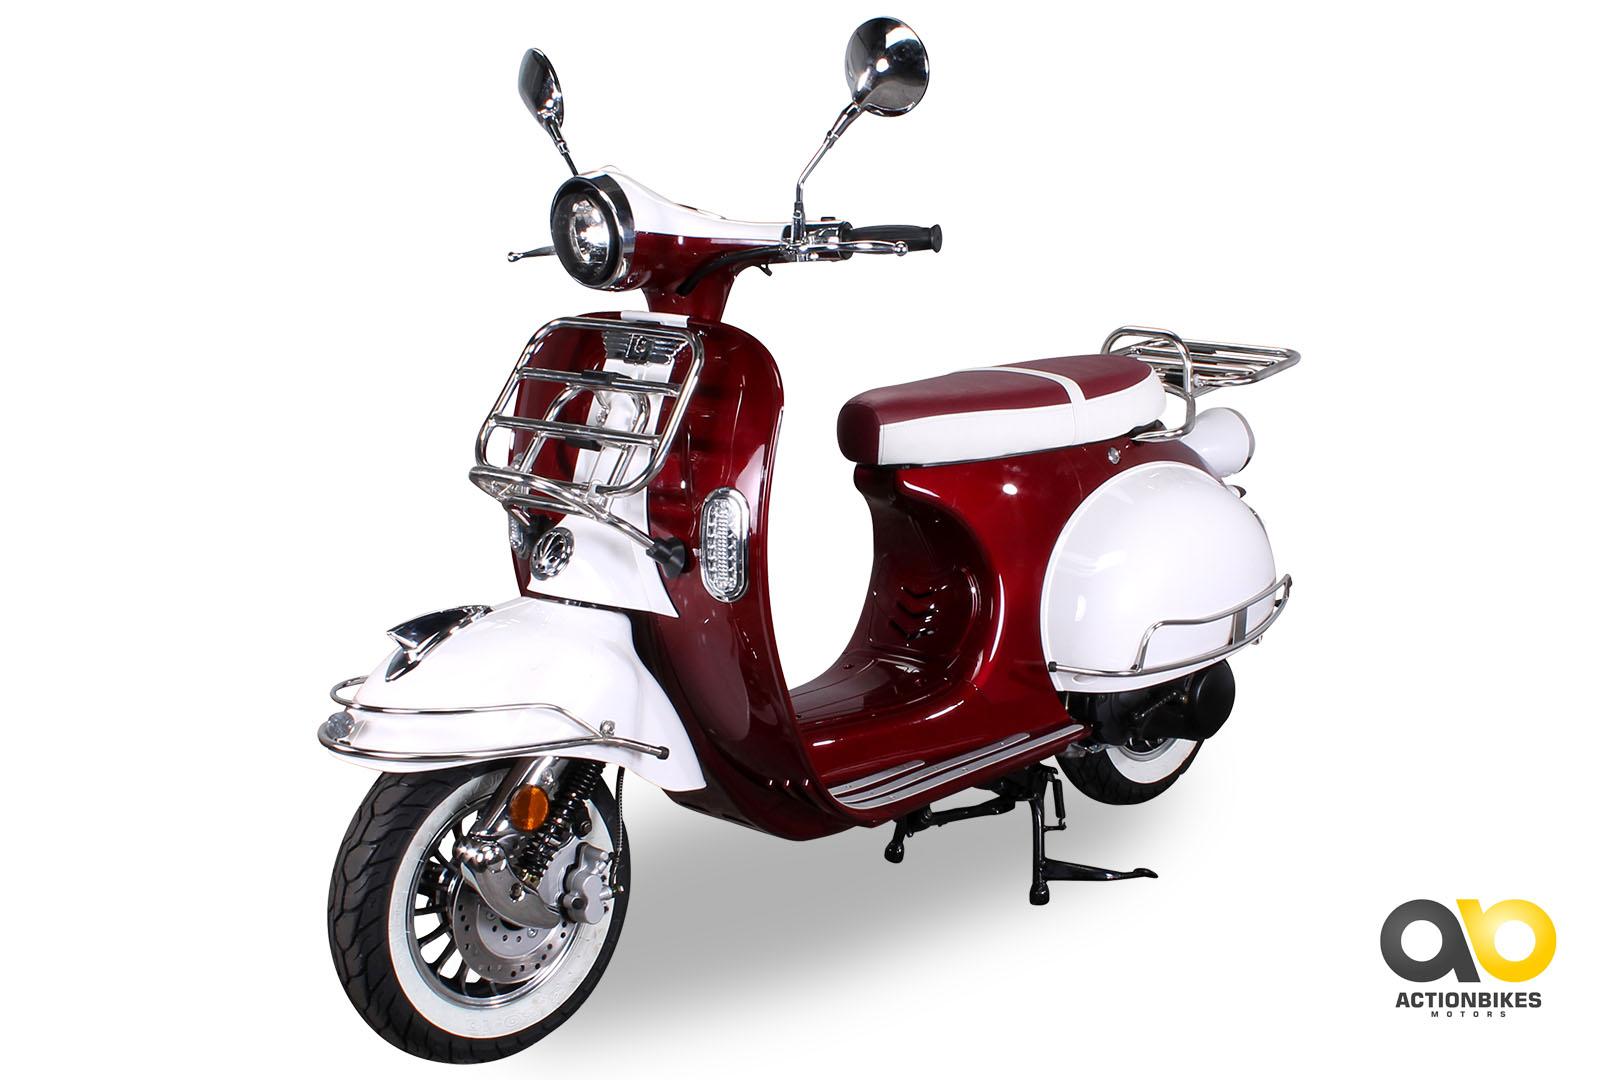 znen retro star scooter 125 cc motor scooter retroroller scooter 125 ccm ebay. Black Bedroom Furniture Sets. Home Design Ideas